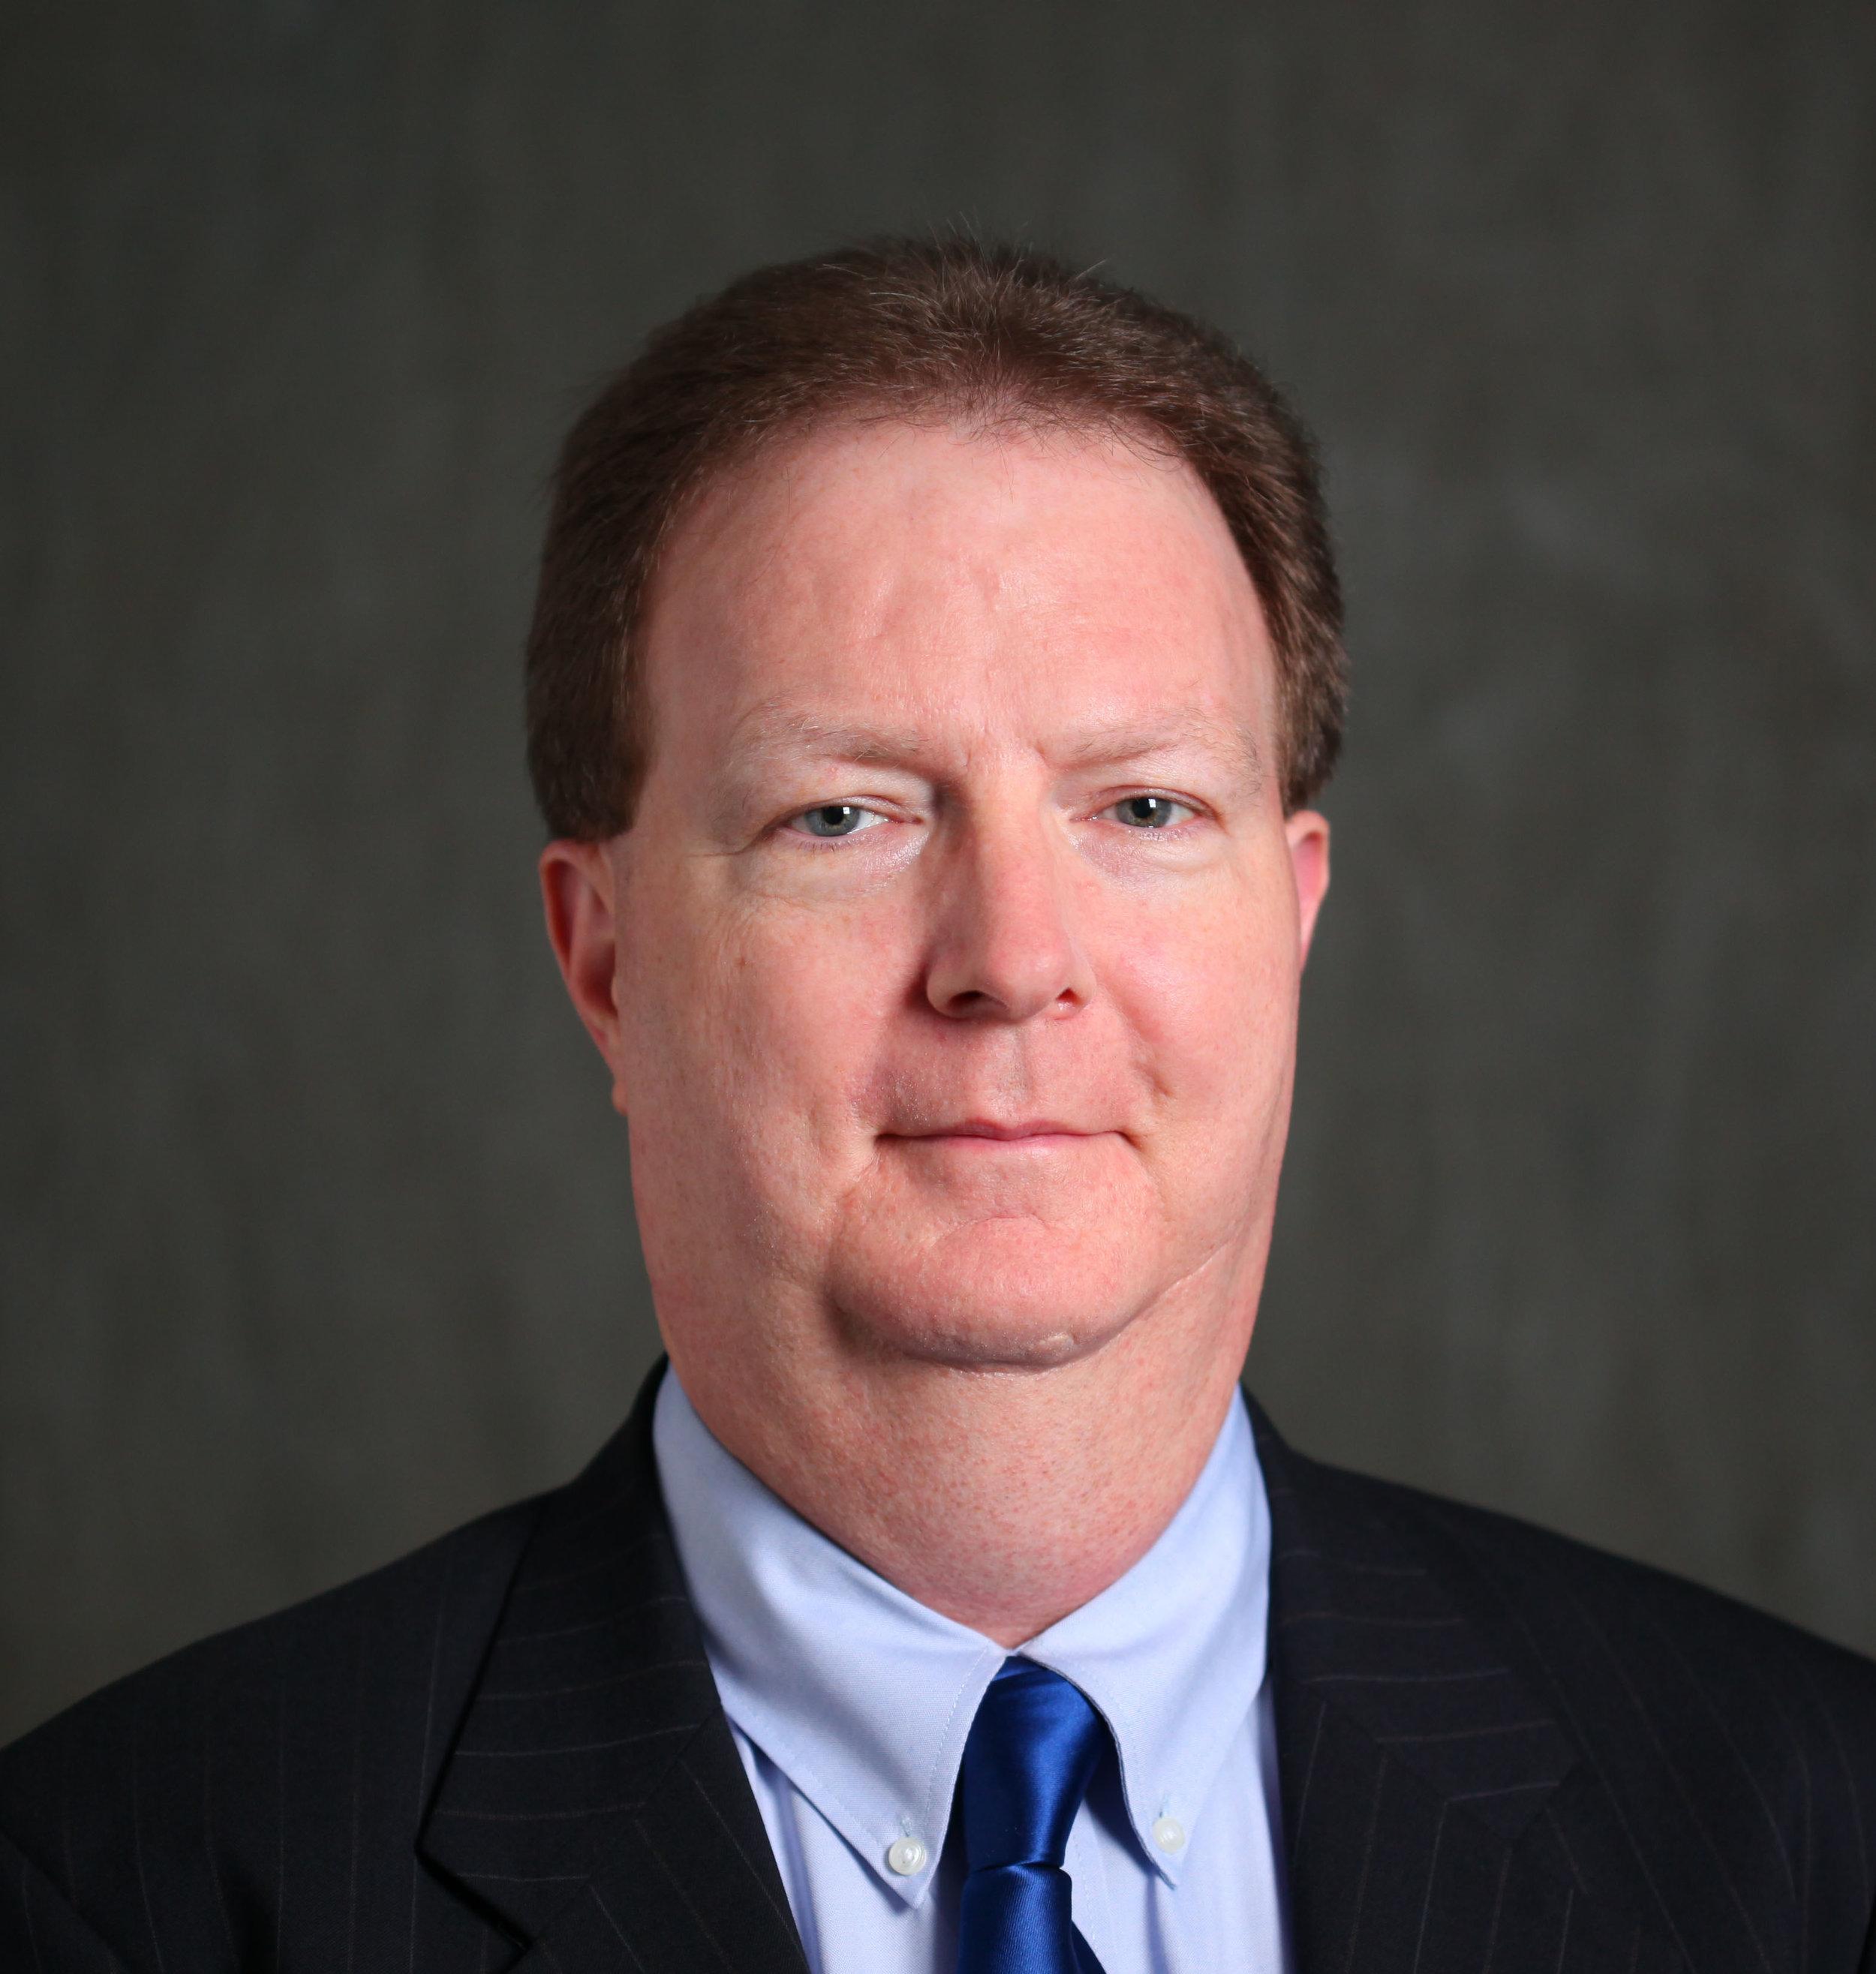 Bill O'Kane Research Vice President at Gartner